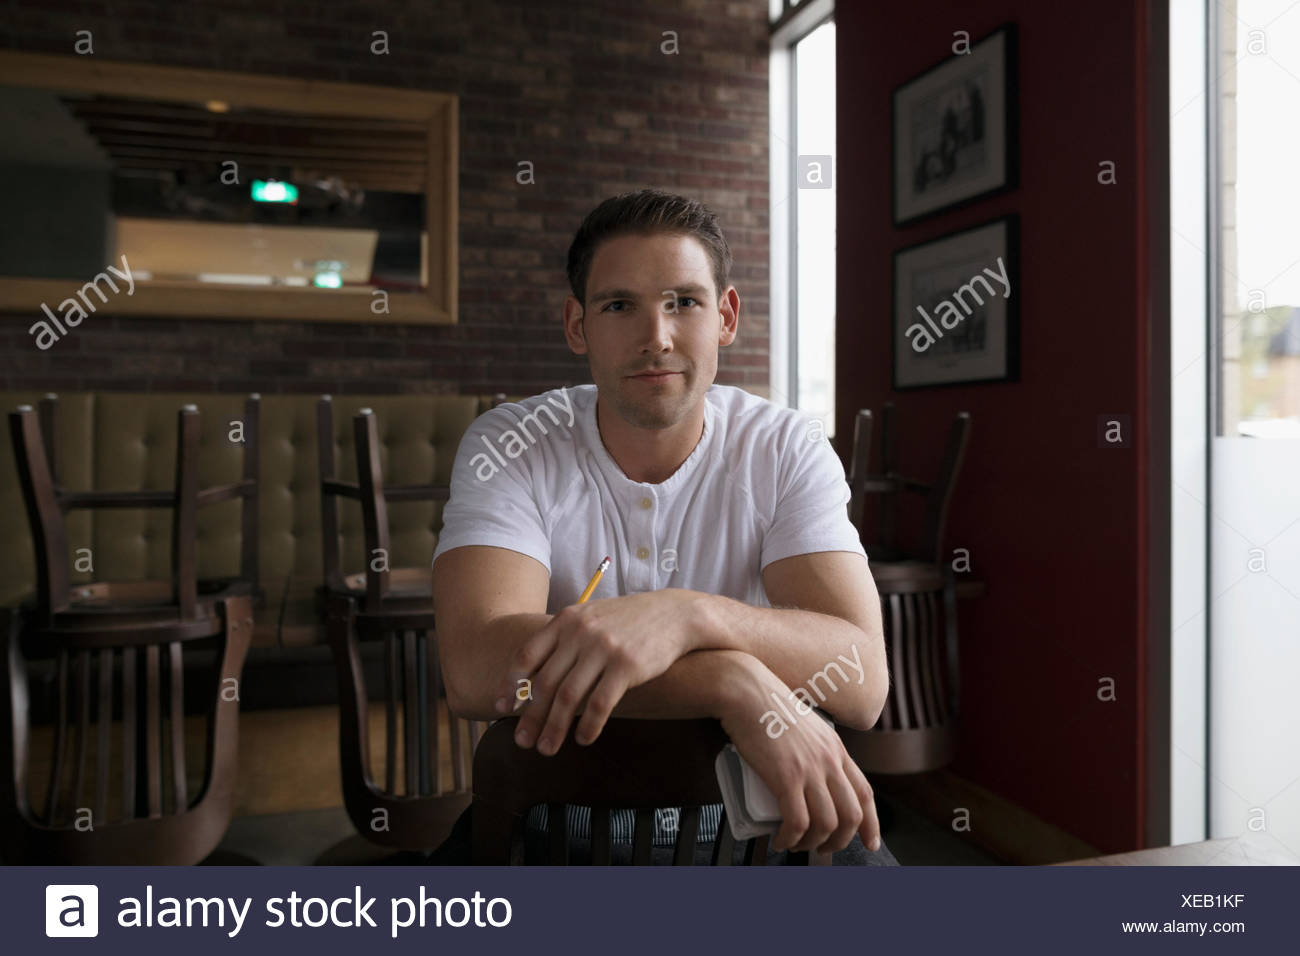 Portrait confident waiter straddling chair in diner - Stock Image